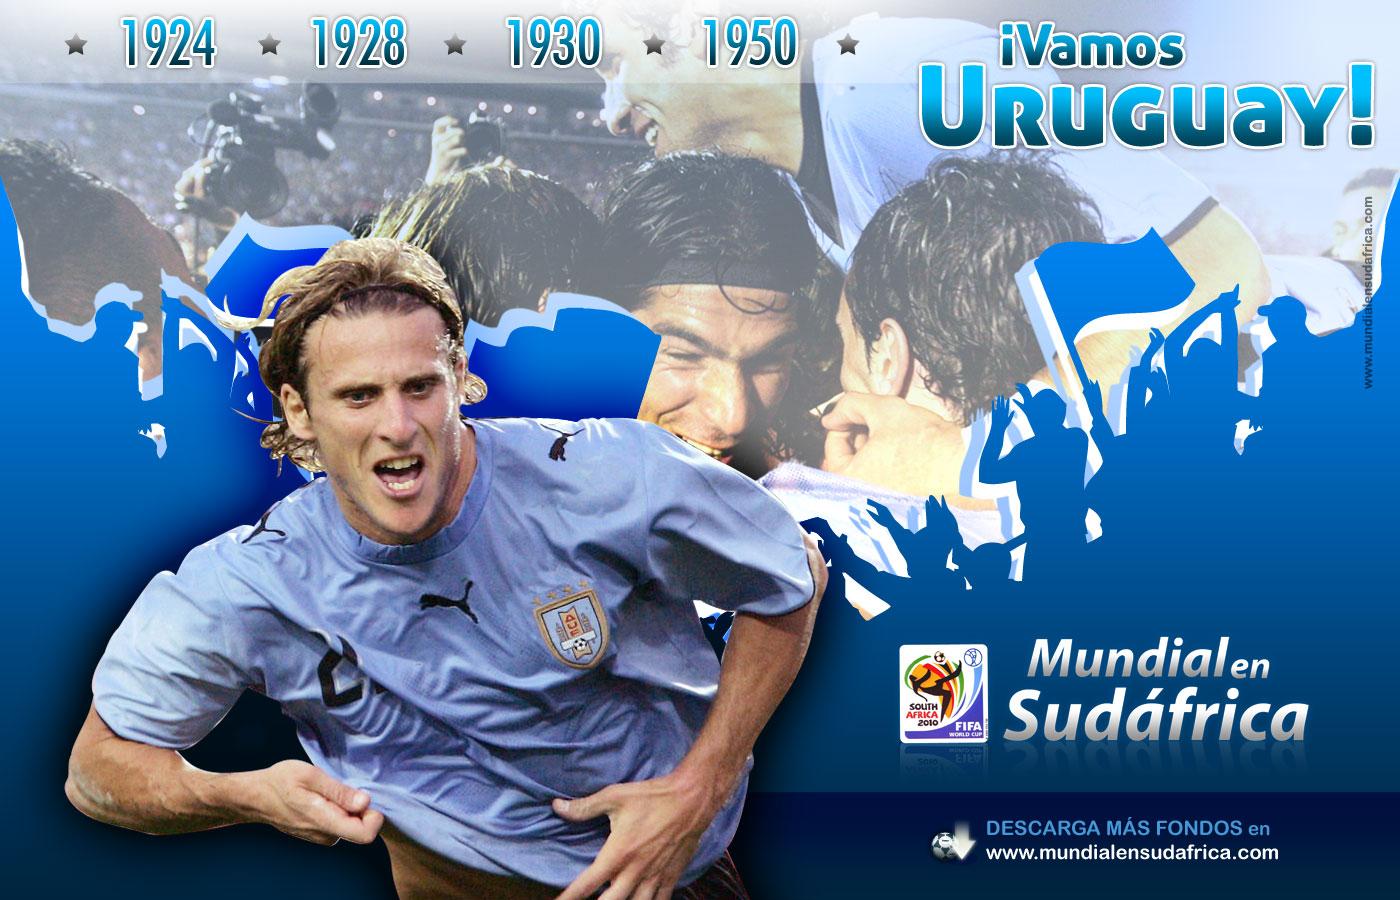 http://2.bp.blogspot.com/_cyXYekoMw8g/TDiQDGTvLyI/AAAAAAAAE44/DTZFPZr-EIA/s1600/uruguay-mundial_1400x900.jpg